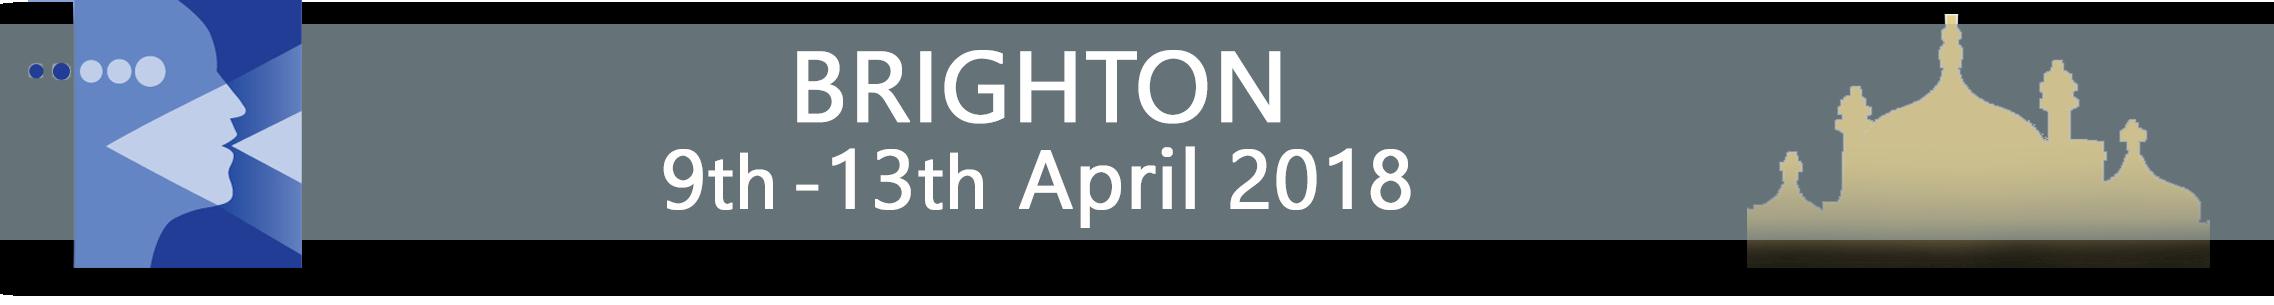 BRIGHTON 3rd - 7th April 2017